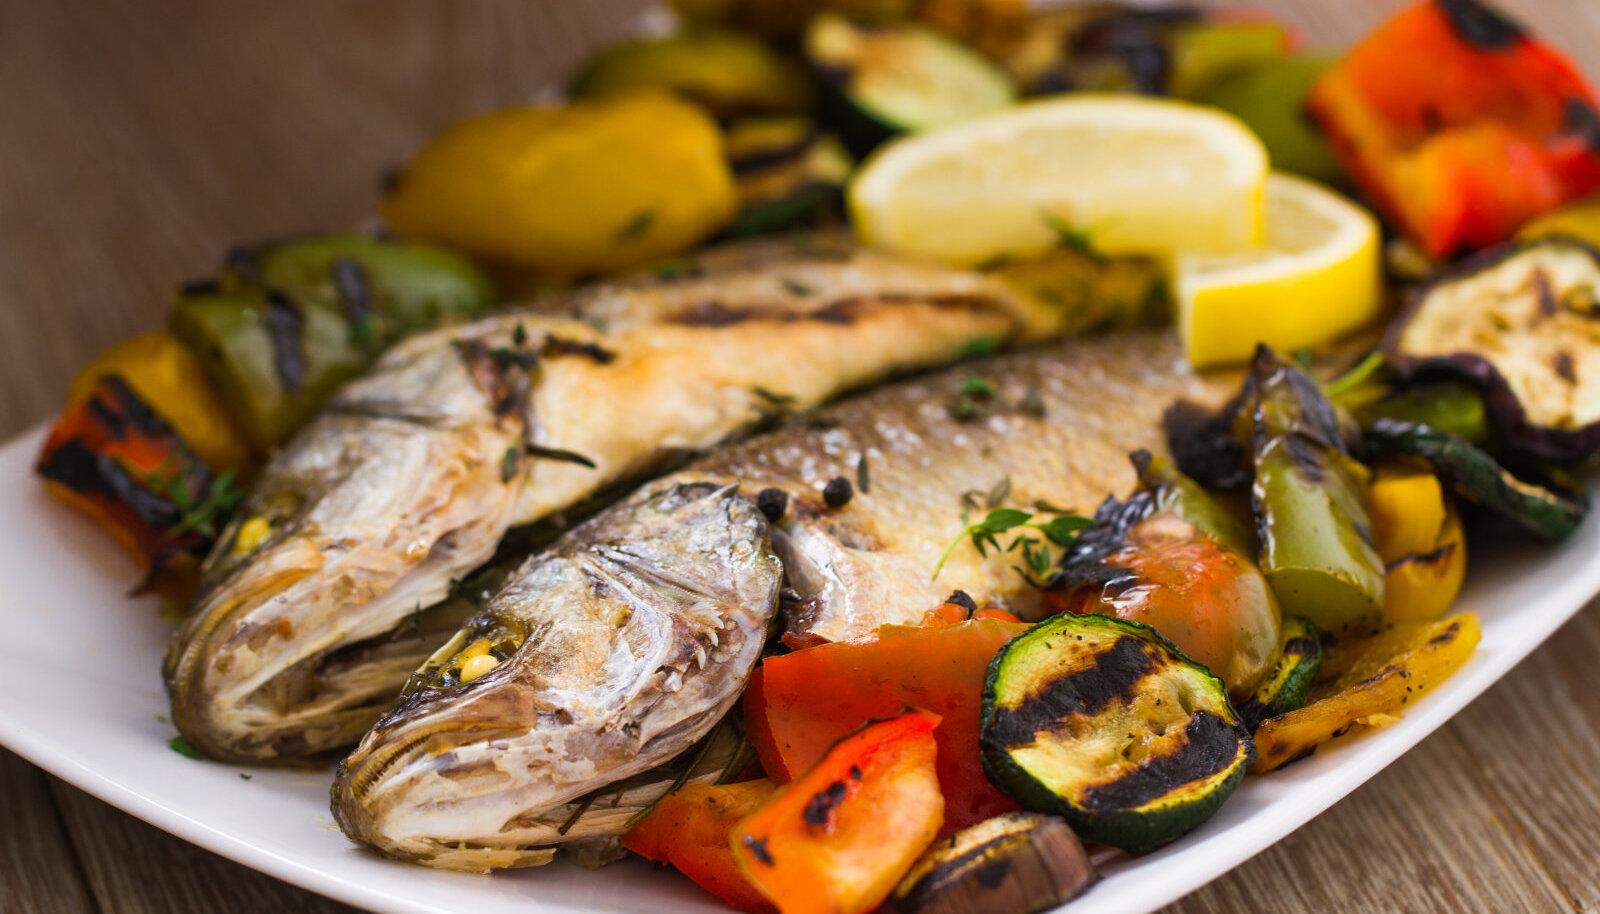 Vahemere toit